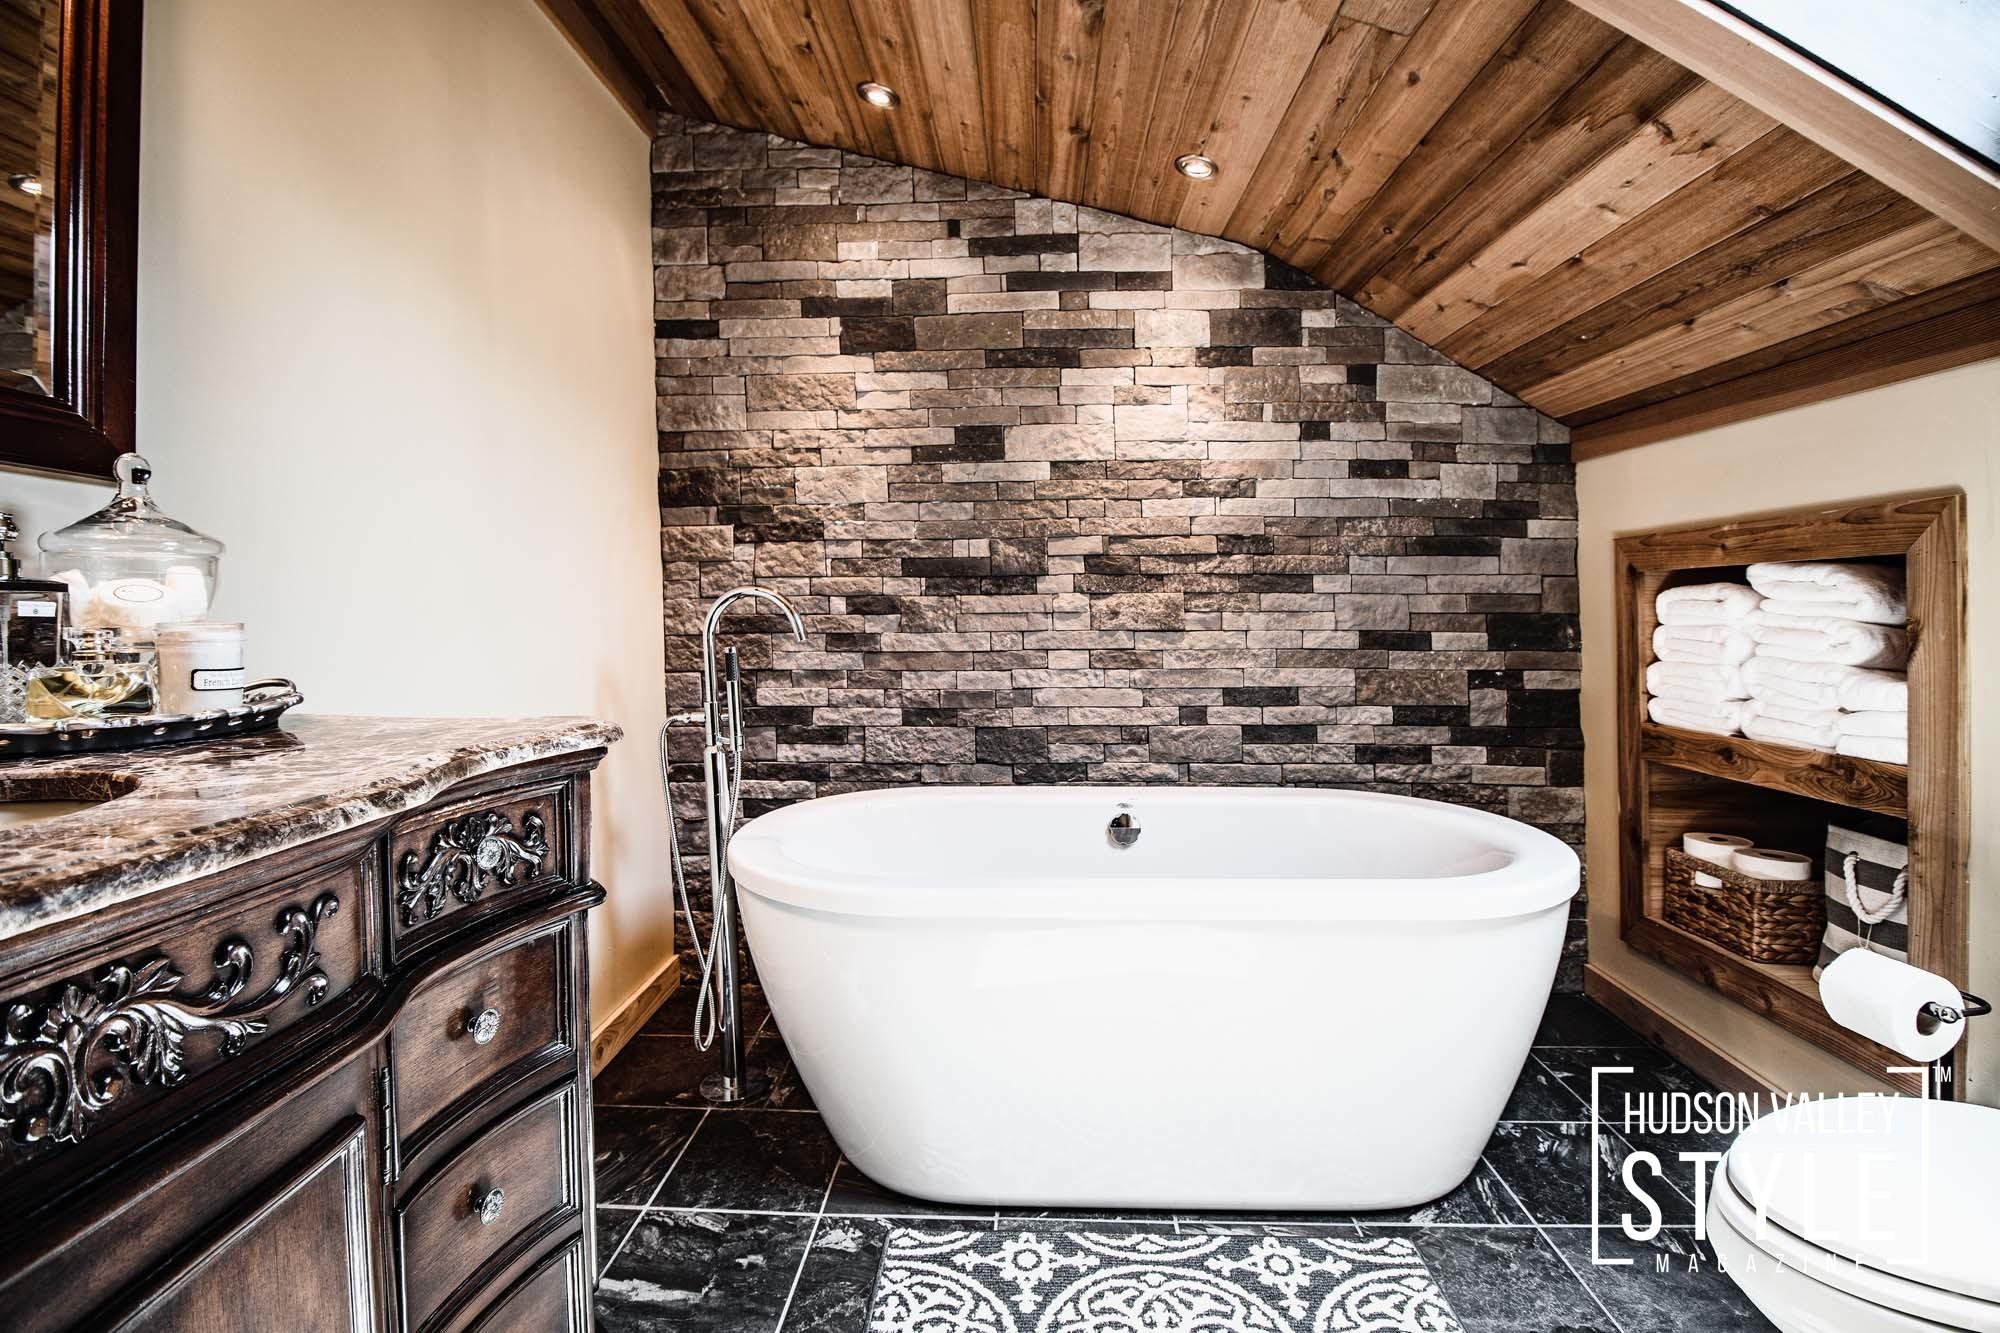 Luxury Hudson Valley Villa for Sale: 19 Greentree Lane, Chester, NY 10918, Orange County